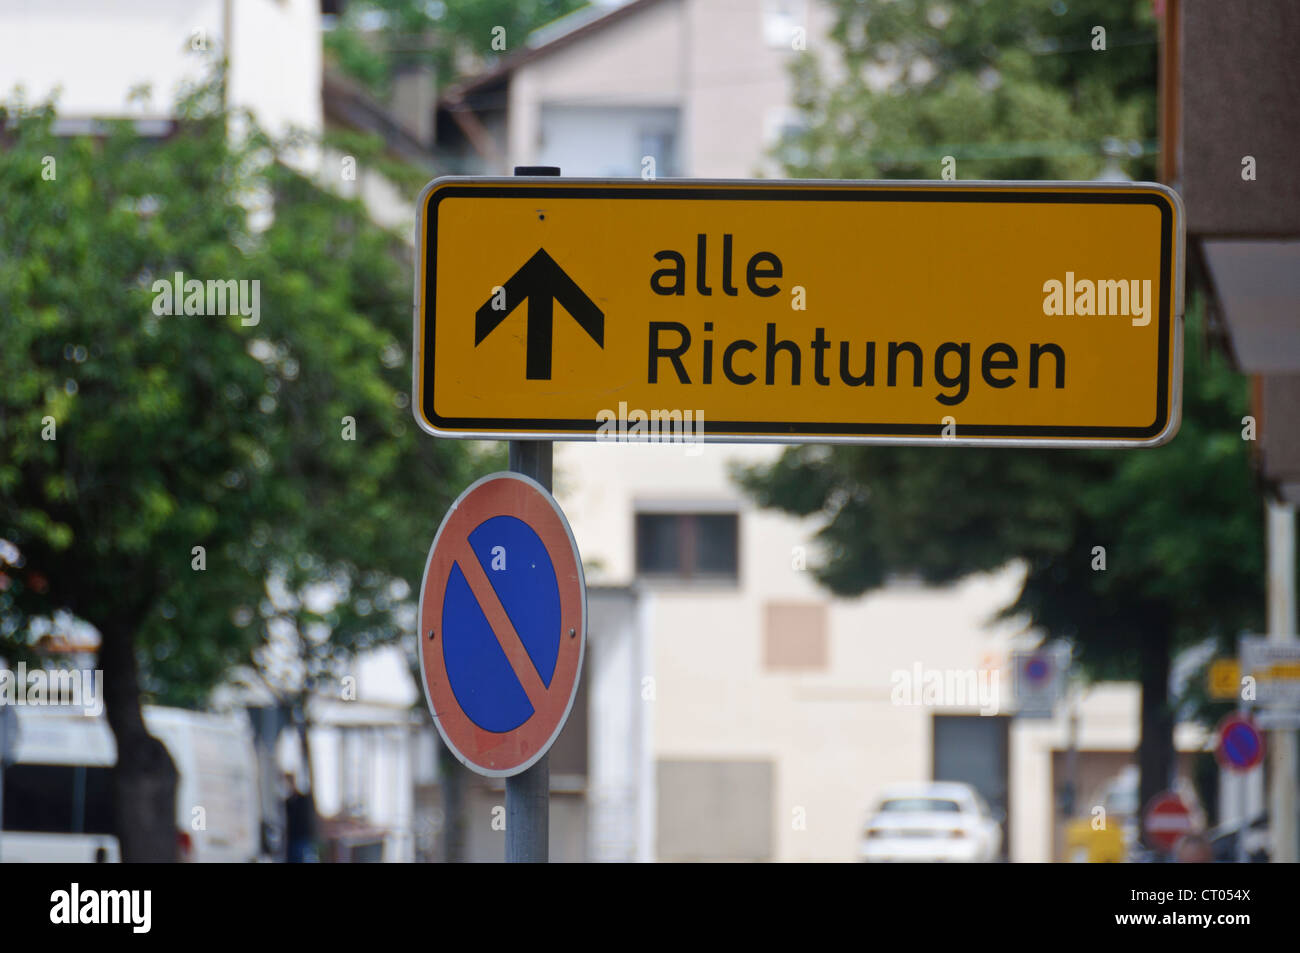 German Direction Sign 'Alle Richtungen' 'All Directions' Traffic Sign 'Eingeschraenktes Halteverbot' - Stock Image